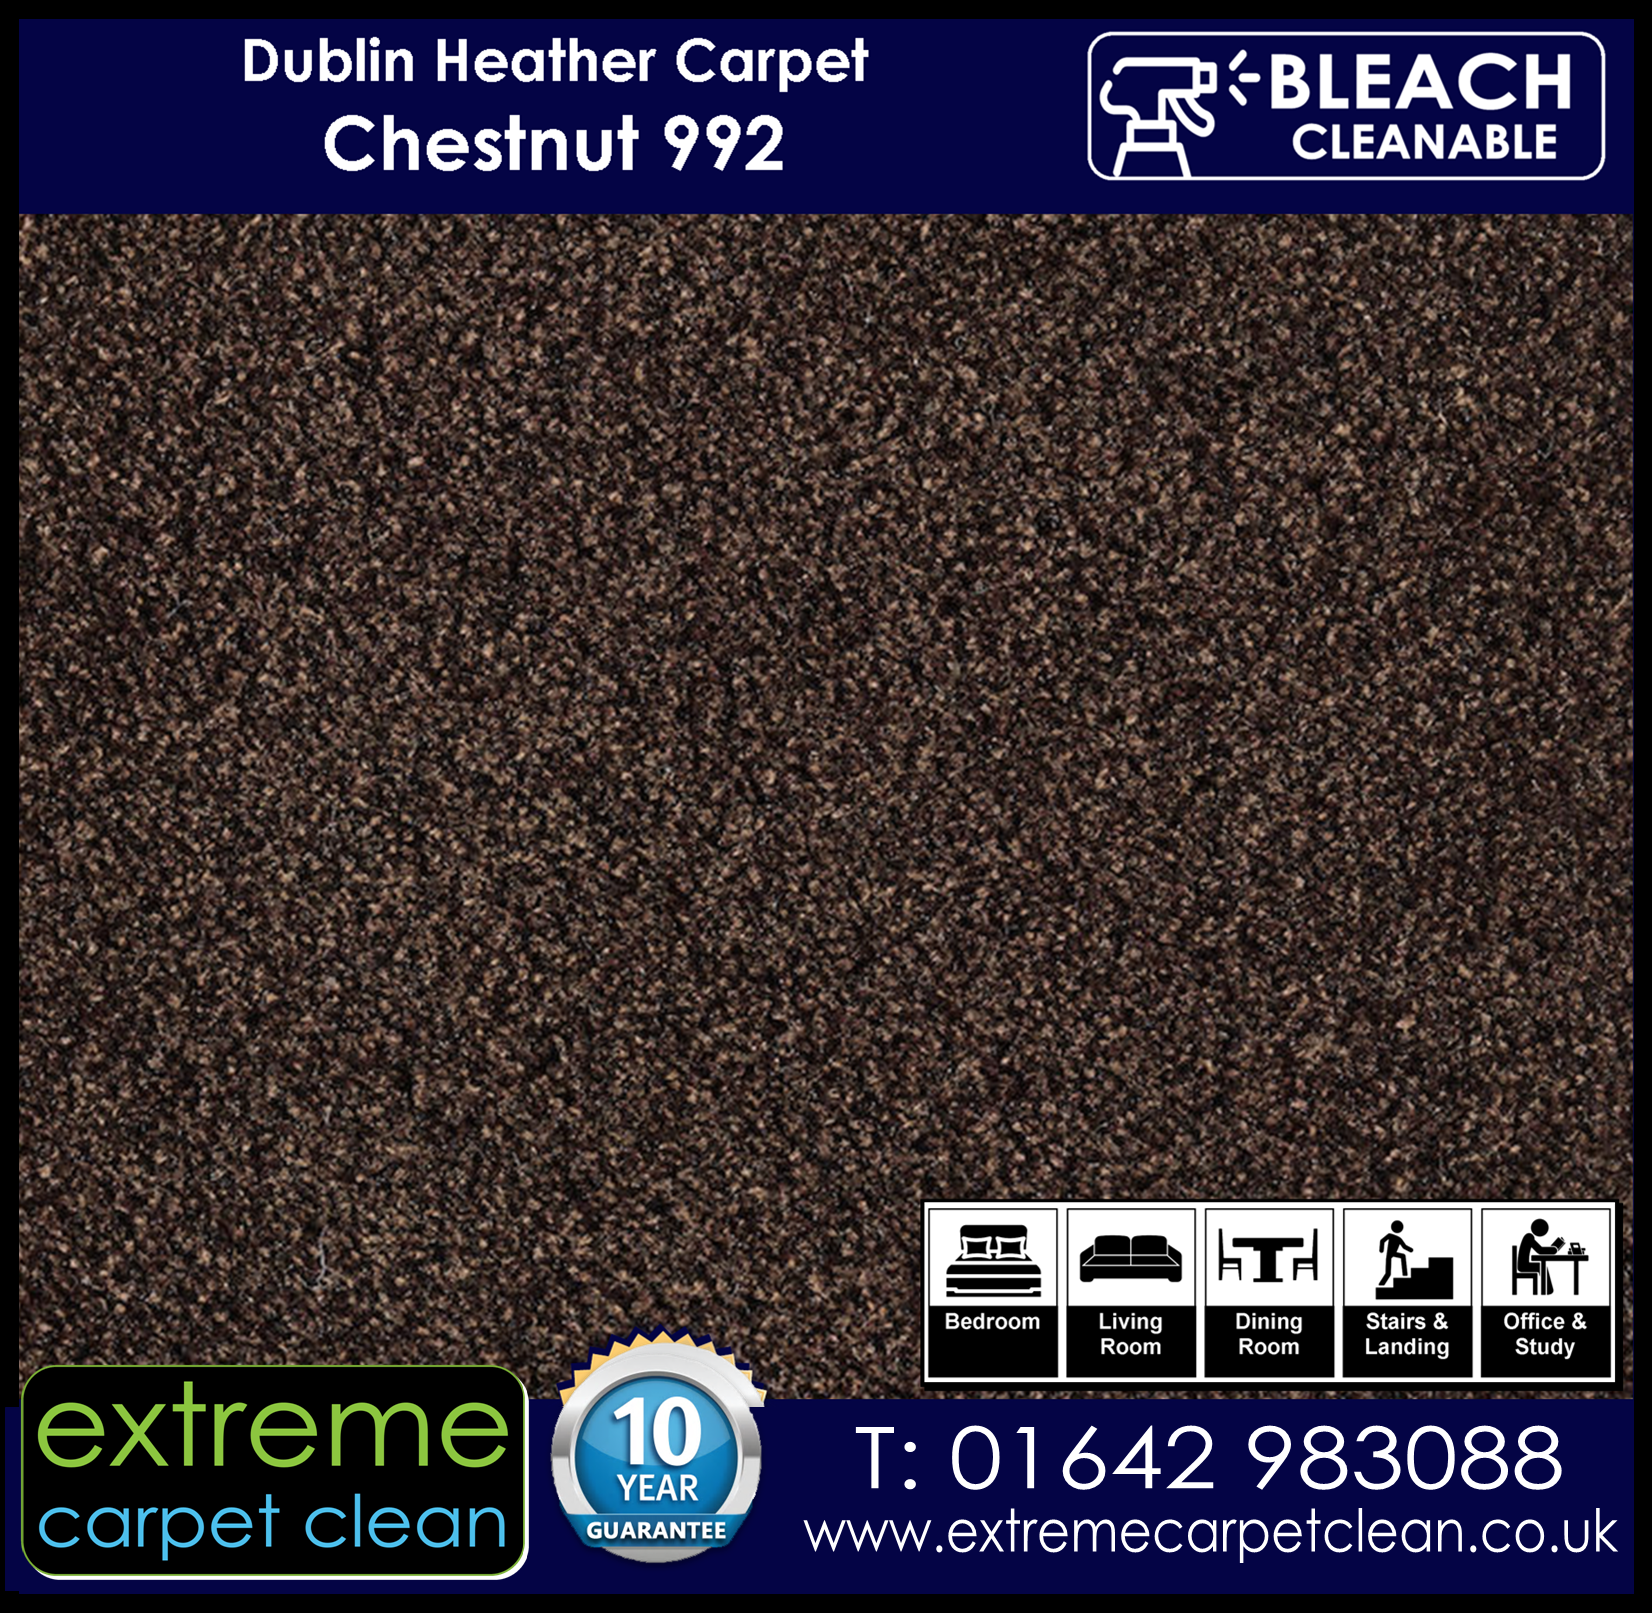 Dublin Heather Carpet Range. Chestnut 992 Extreme Carpet Clean